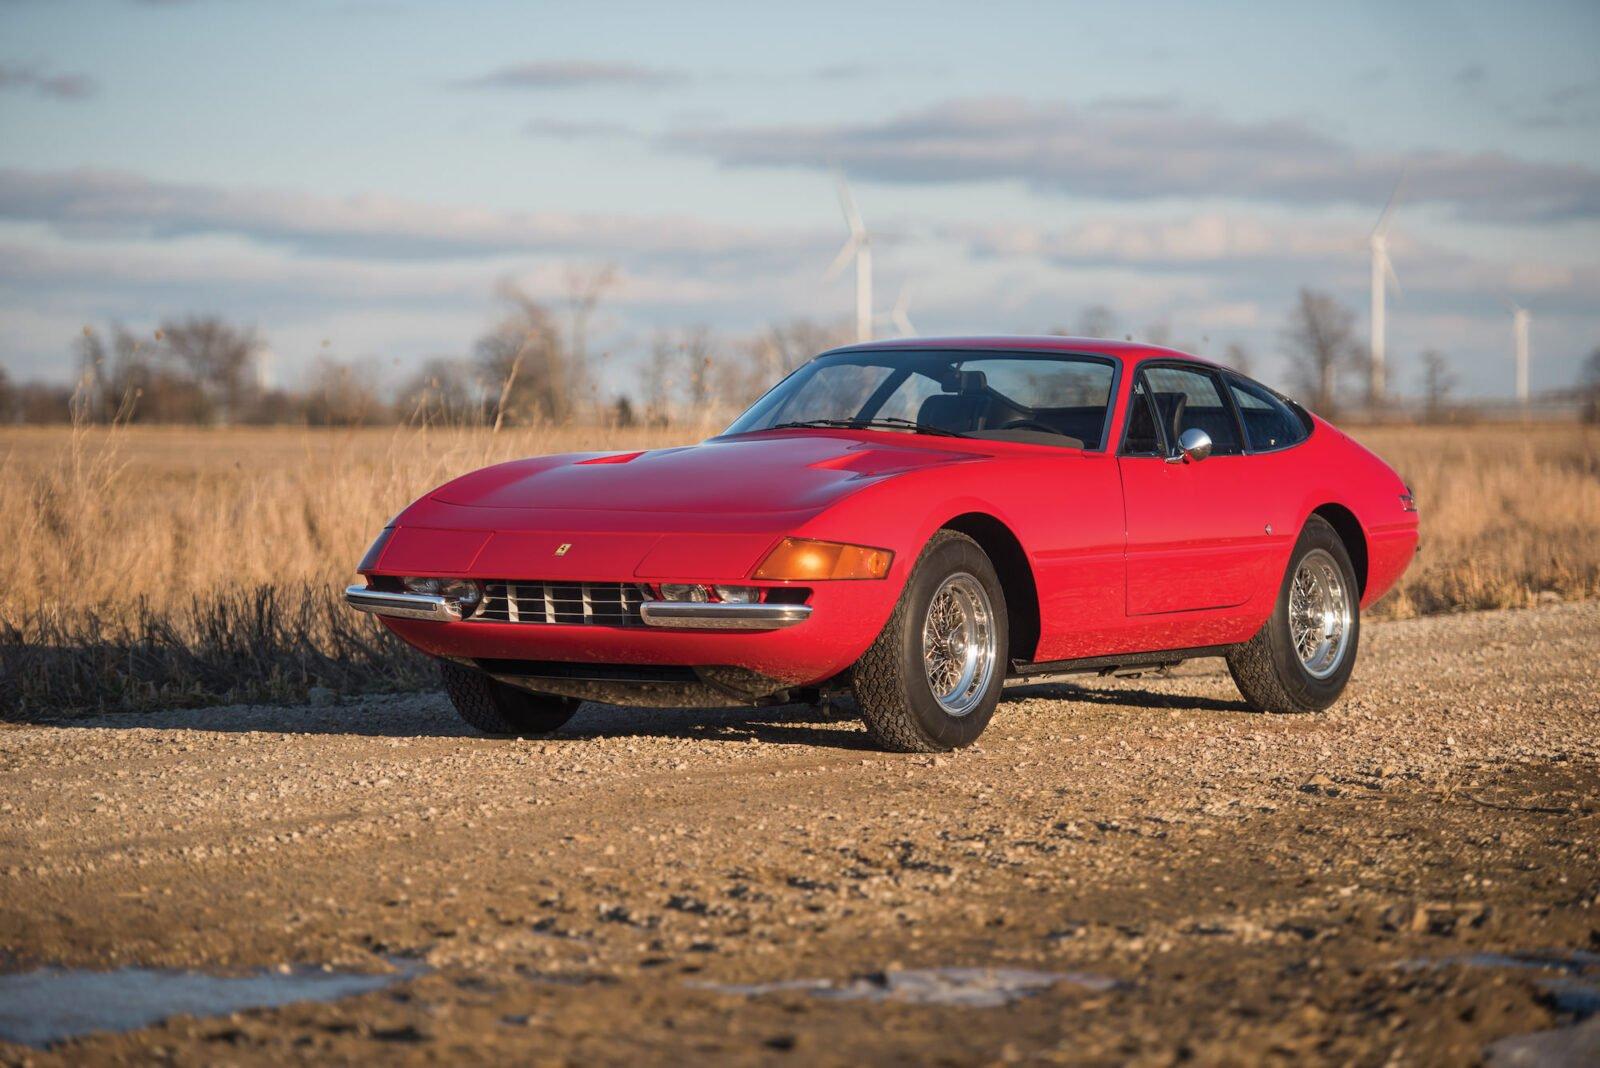 Ferrari 365 GTB4 Daytona 1600x1068 - 1972 Ferrari 365 GTB/4 Daytona